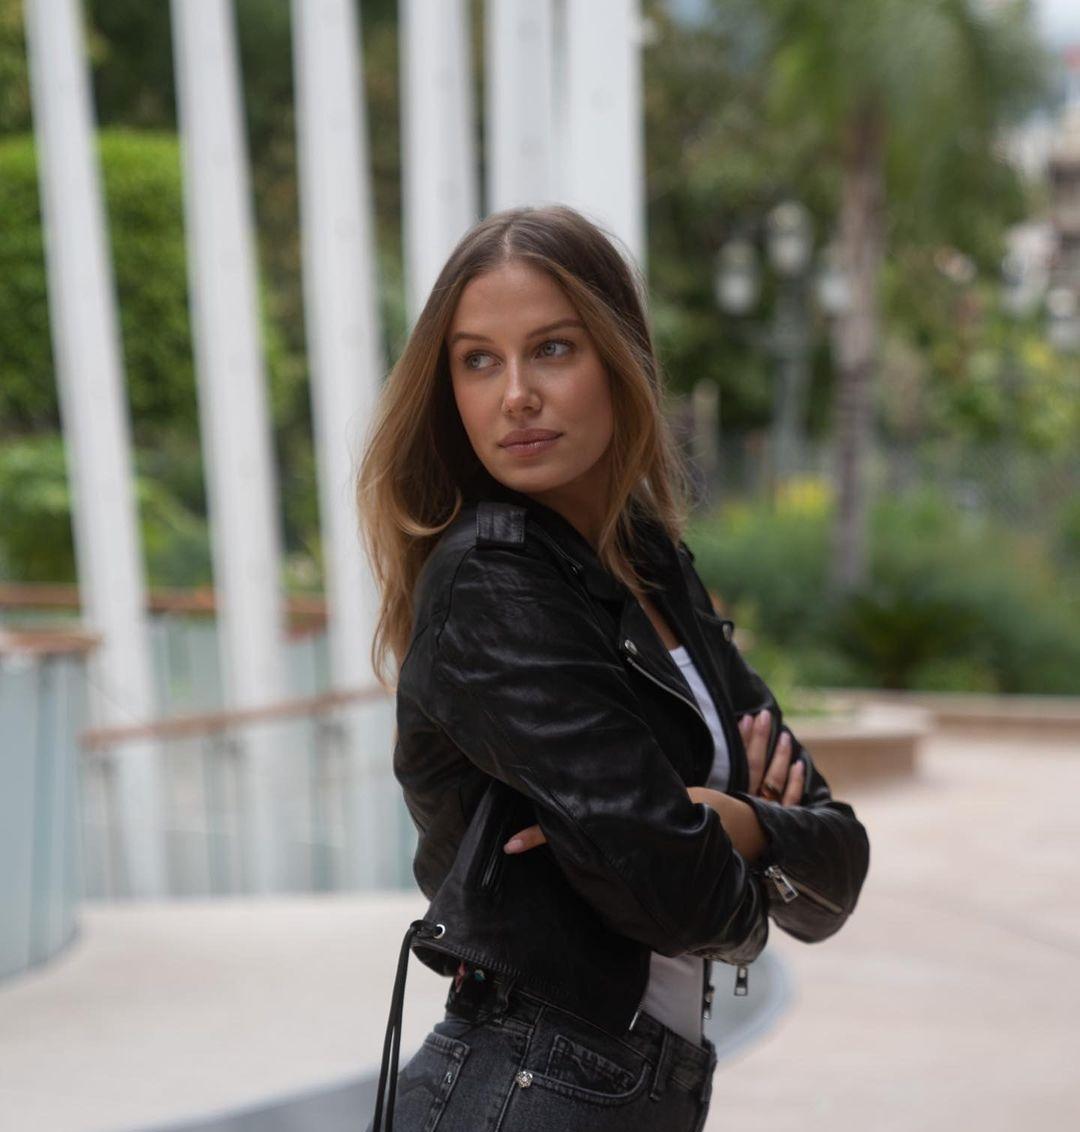 Nicole-Poturalski-Wallpapers-Insta-Fit-Bio-10